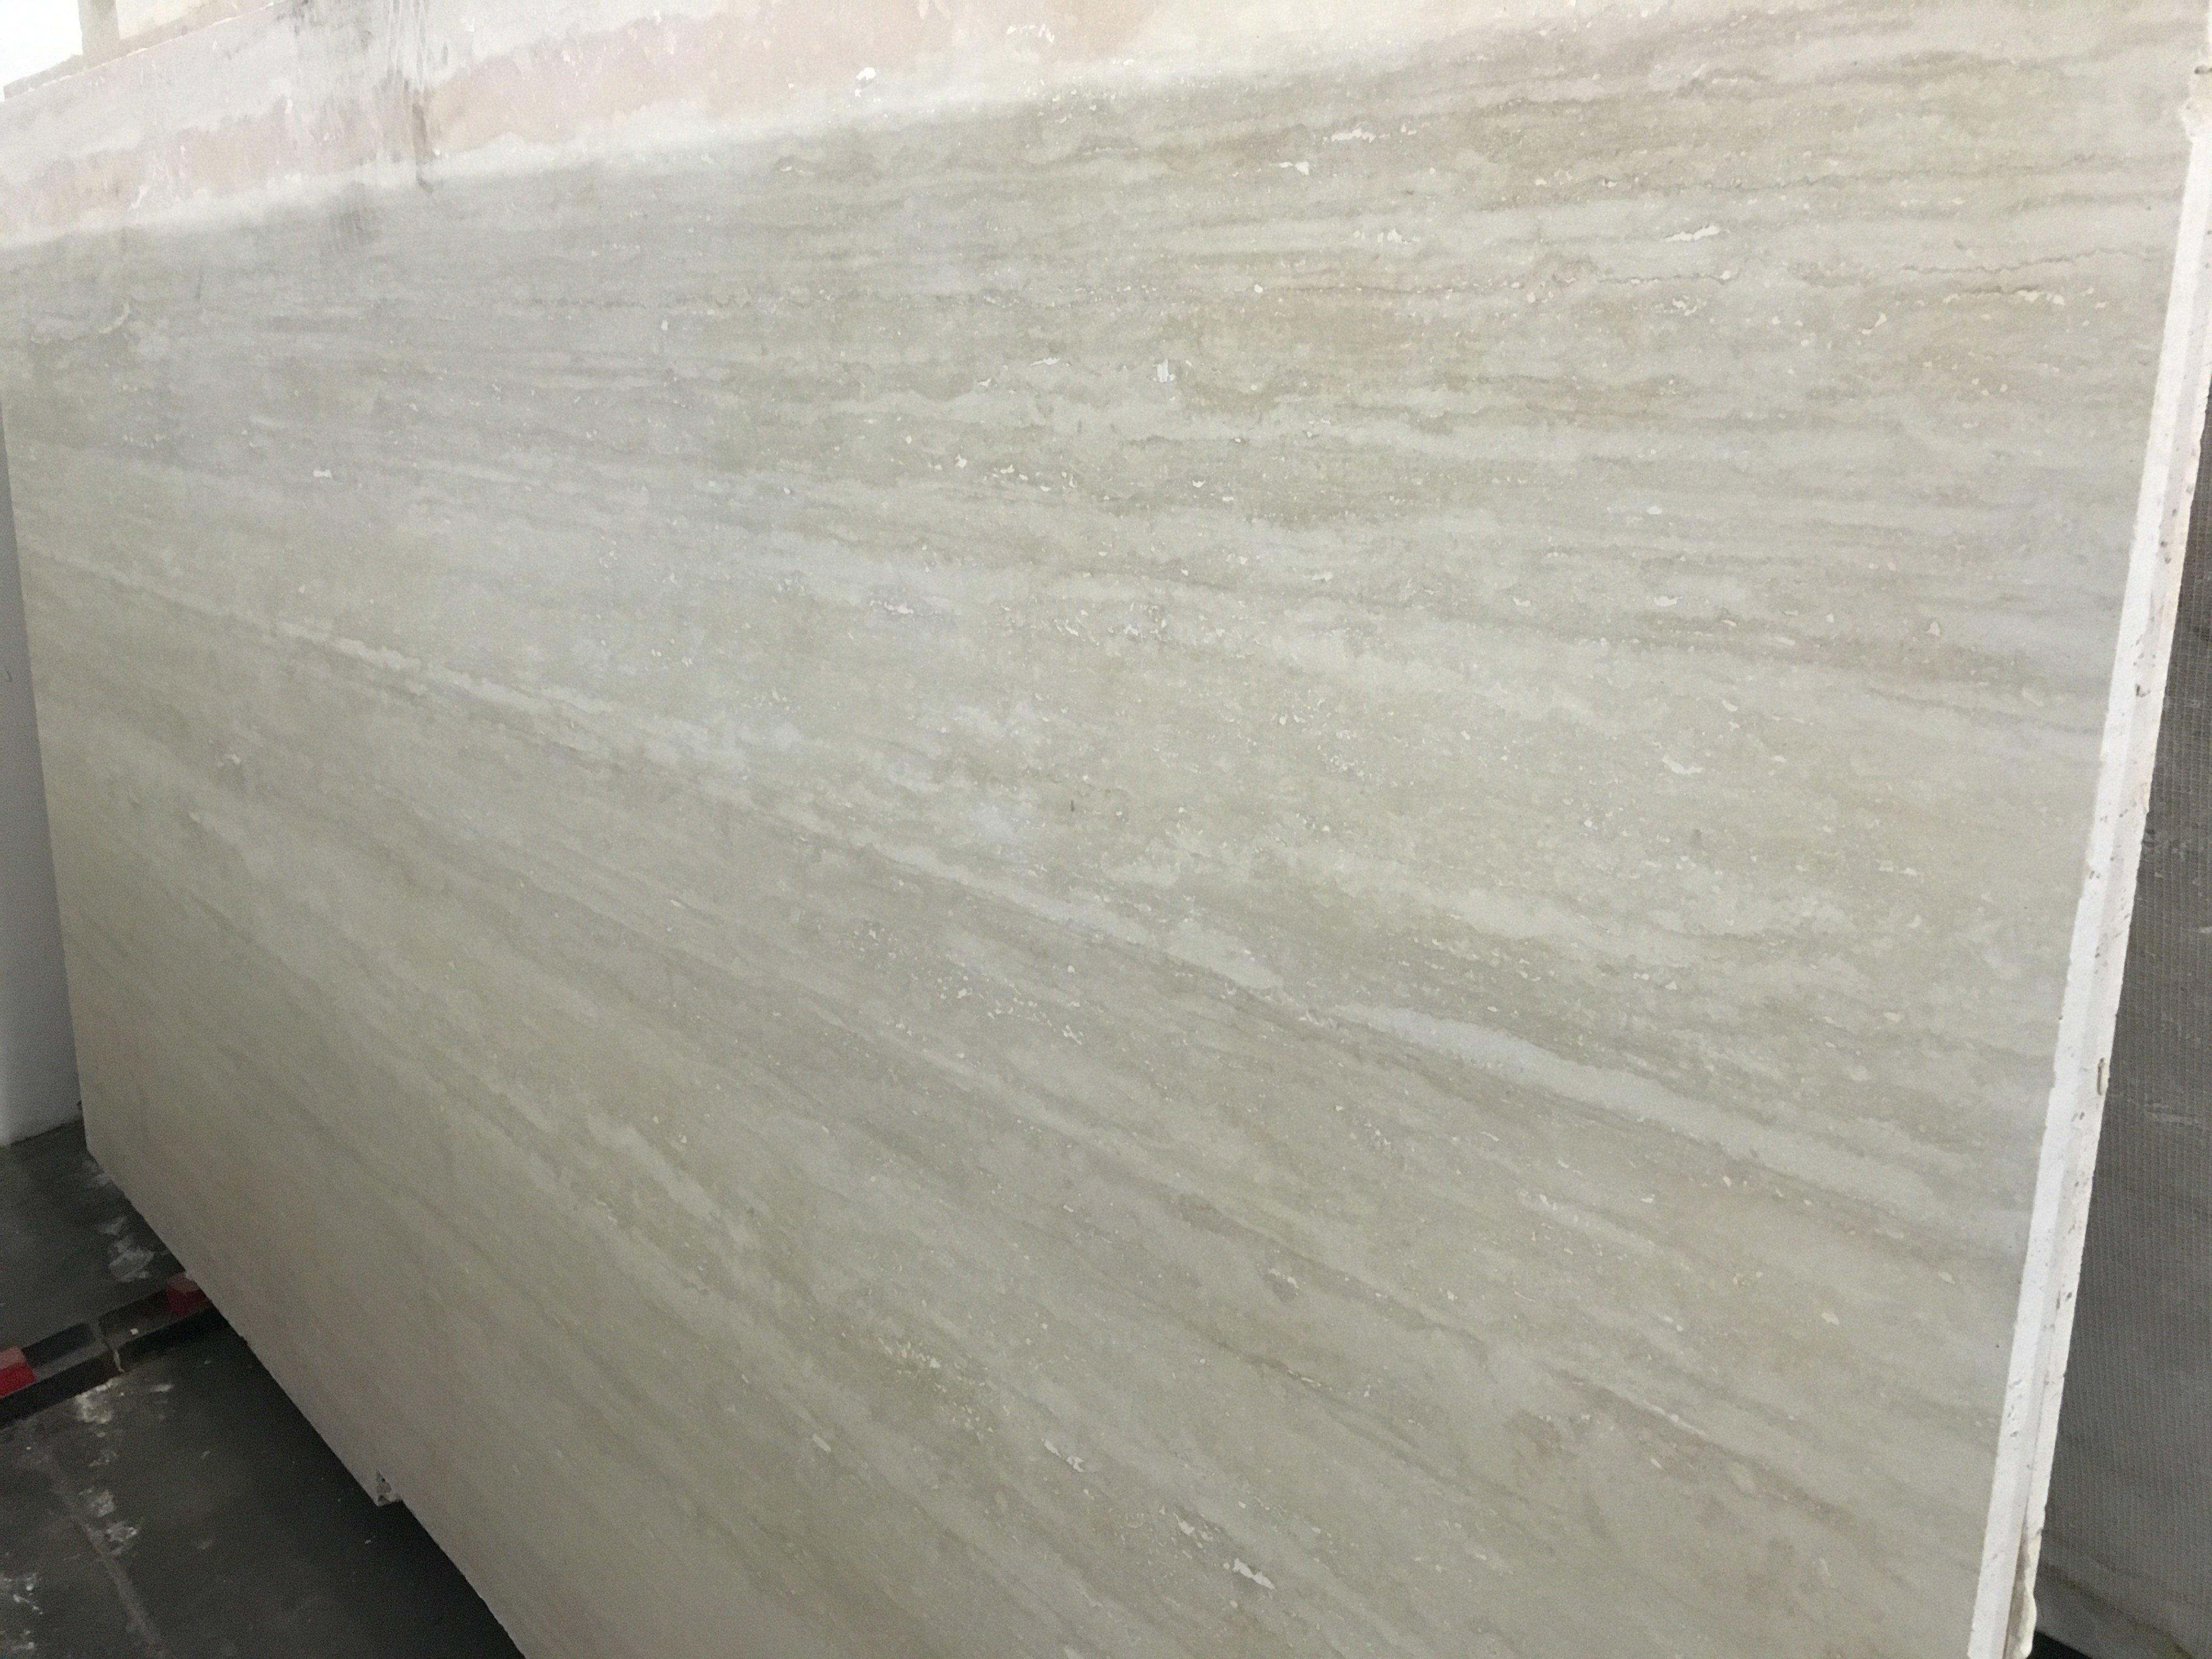 Ivory Vein Cut Honed Travertine Slab Trendy Surfaces